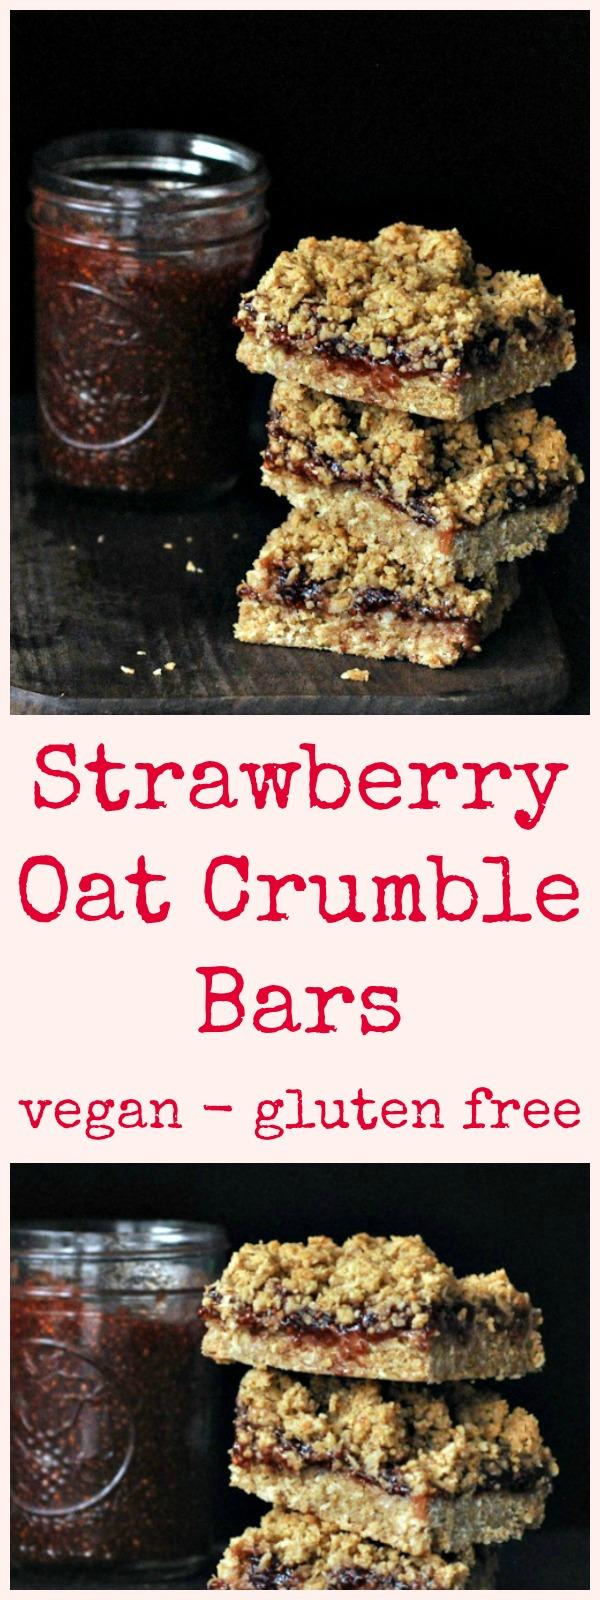 Strawberry Oat Crumble Bars @spabettie #vegan #glutenfree